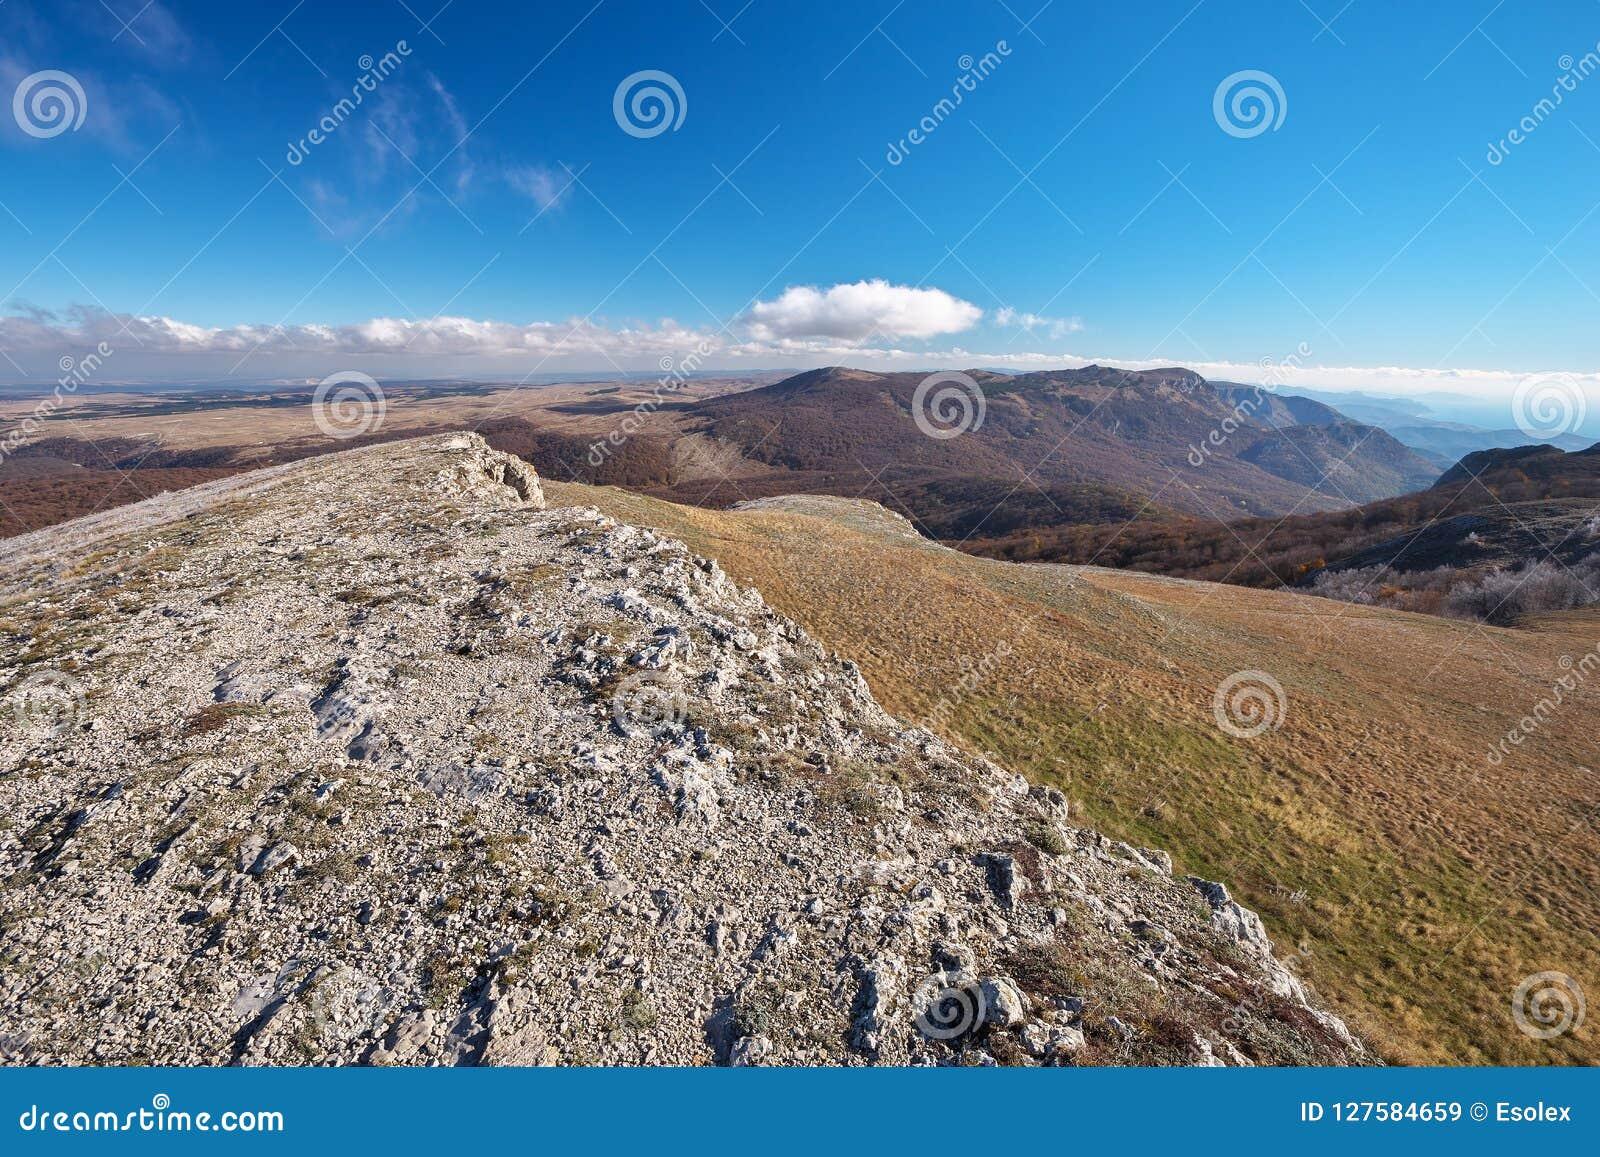 Schöne Berglandschaft, fotografiert im Herbst